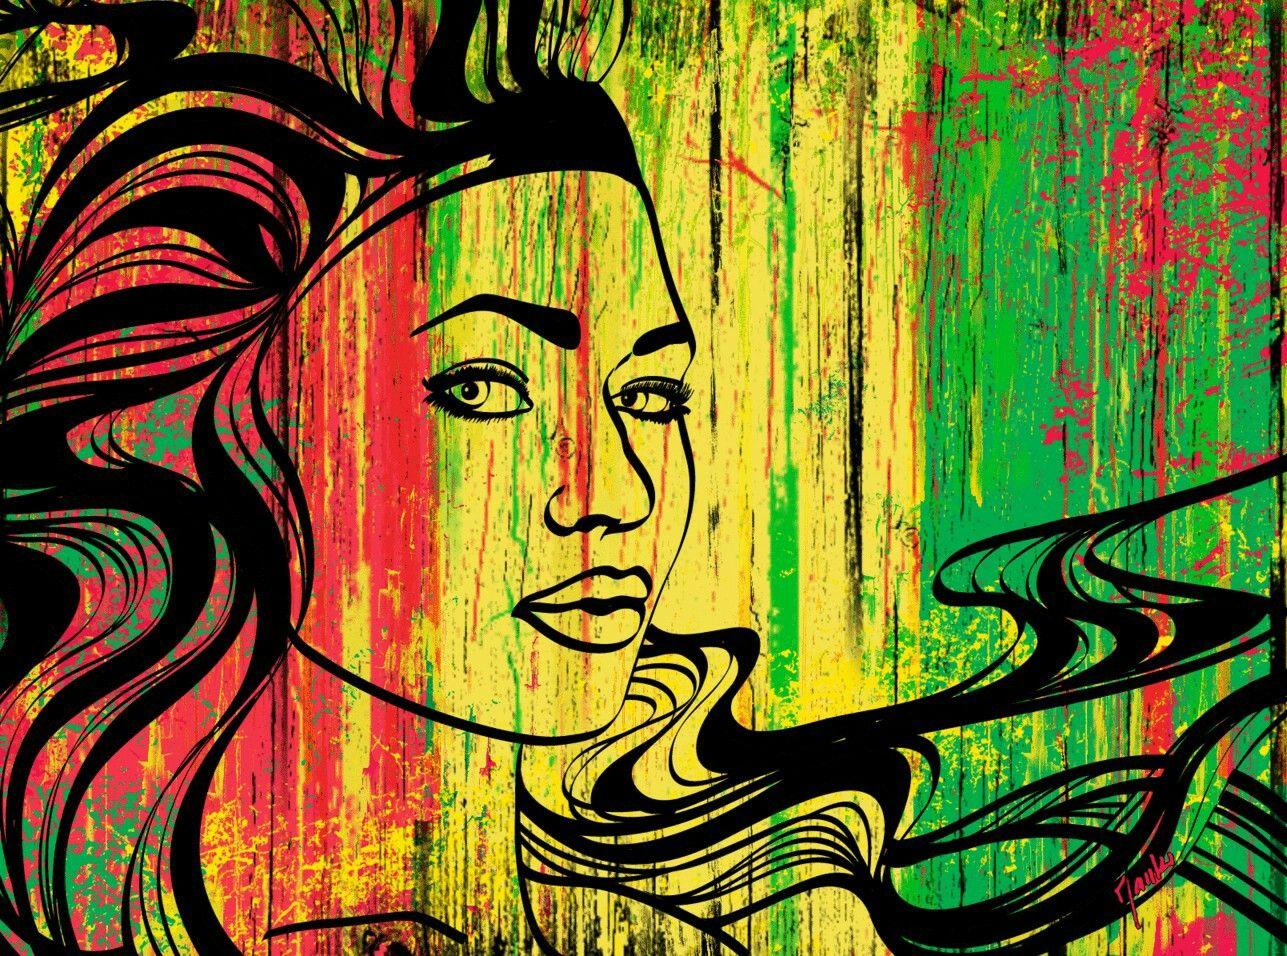 Reggae Woman | Reggae | Art, Wallpaper, Lion wallpaper